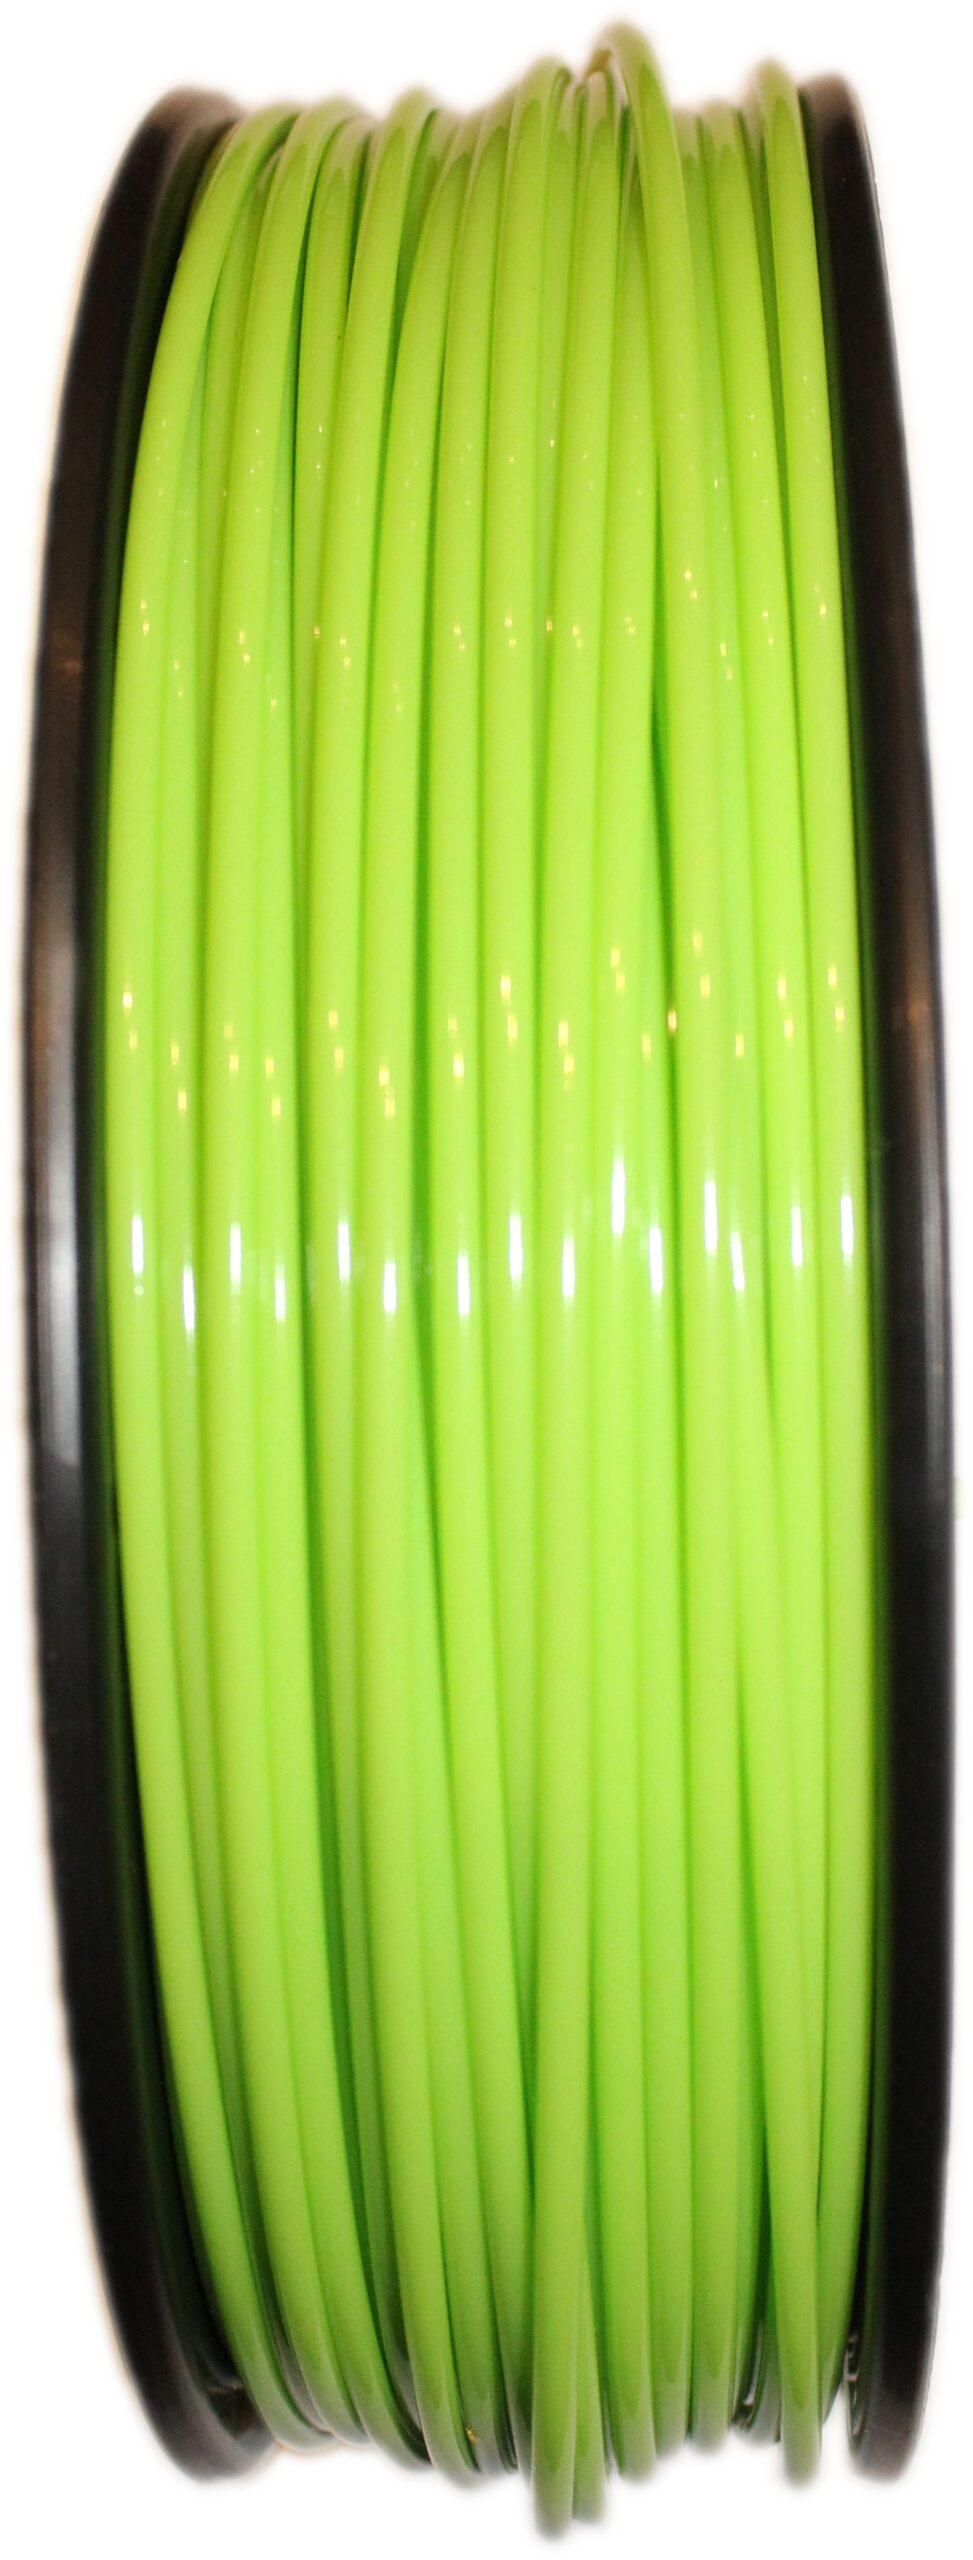 Aurarum PLA 3D Printer Filament - Lime Green 2.85mm 1Kg